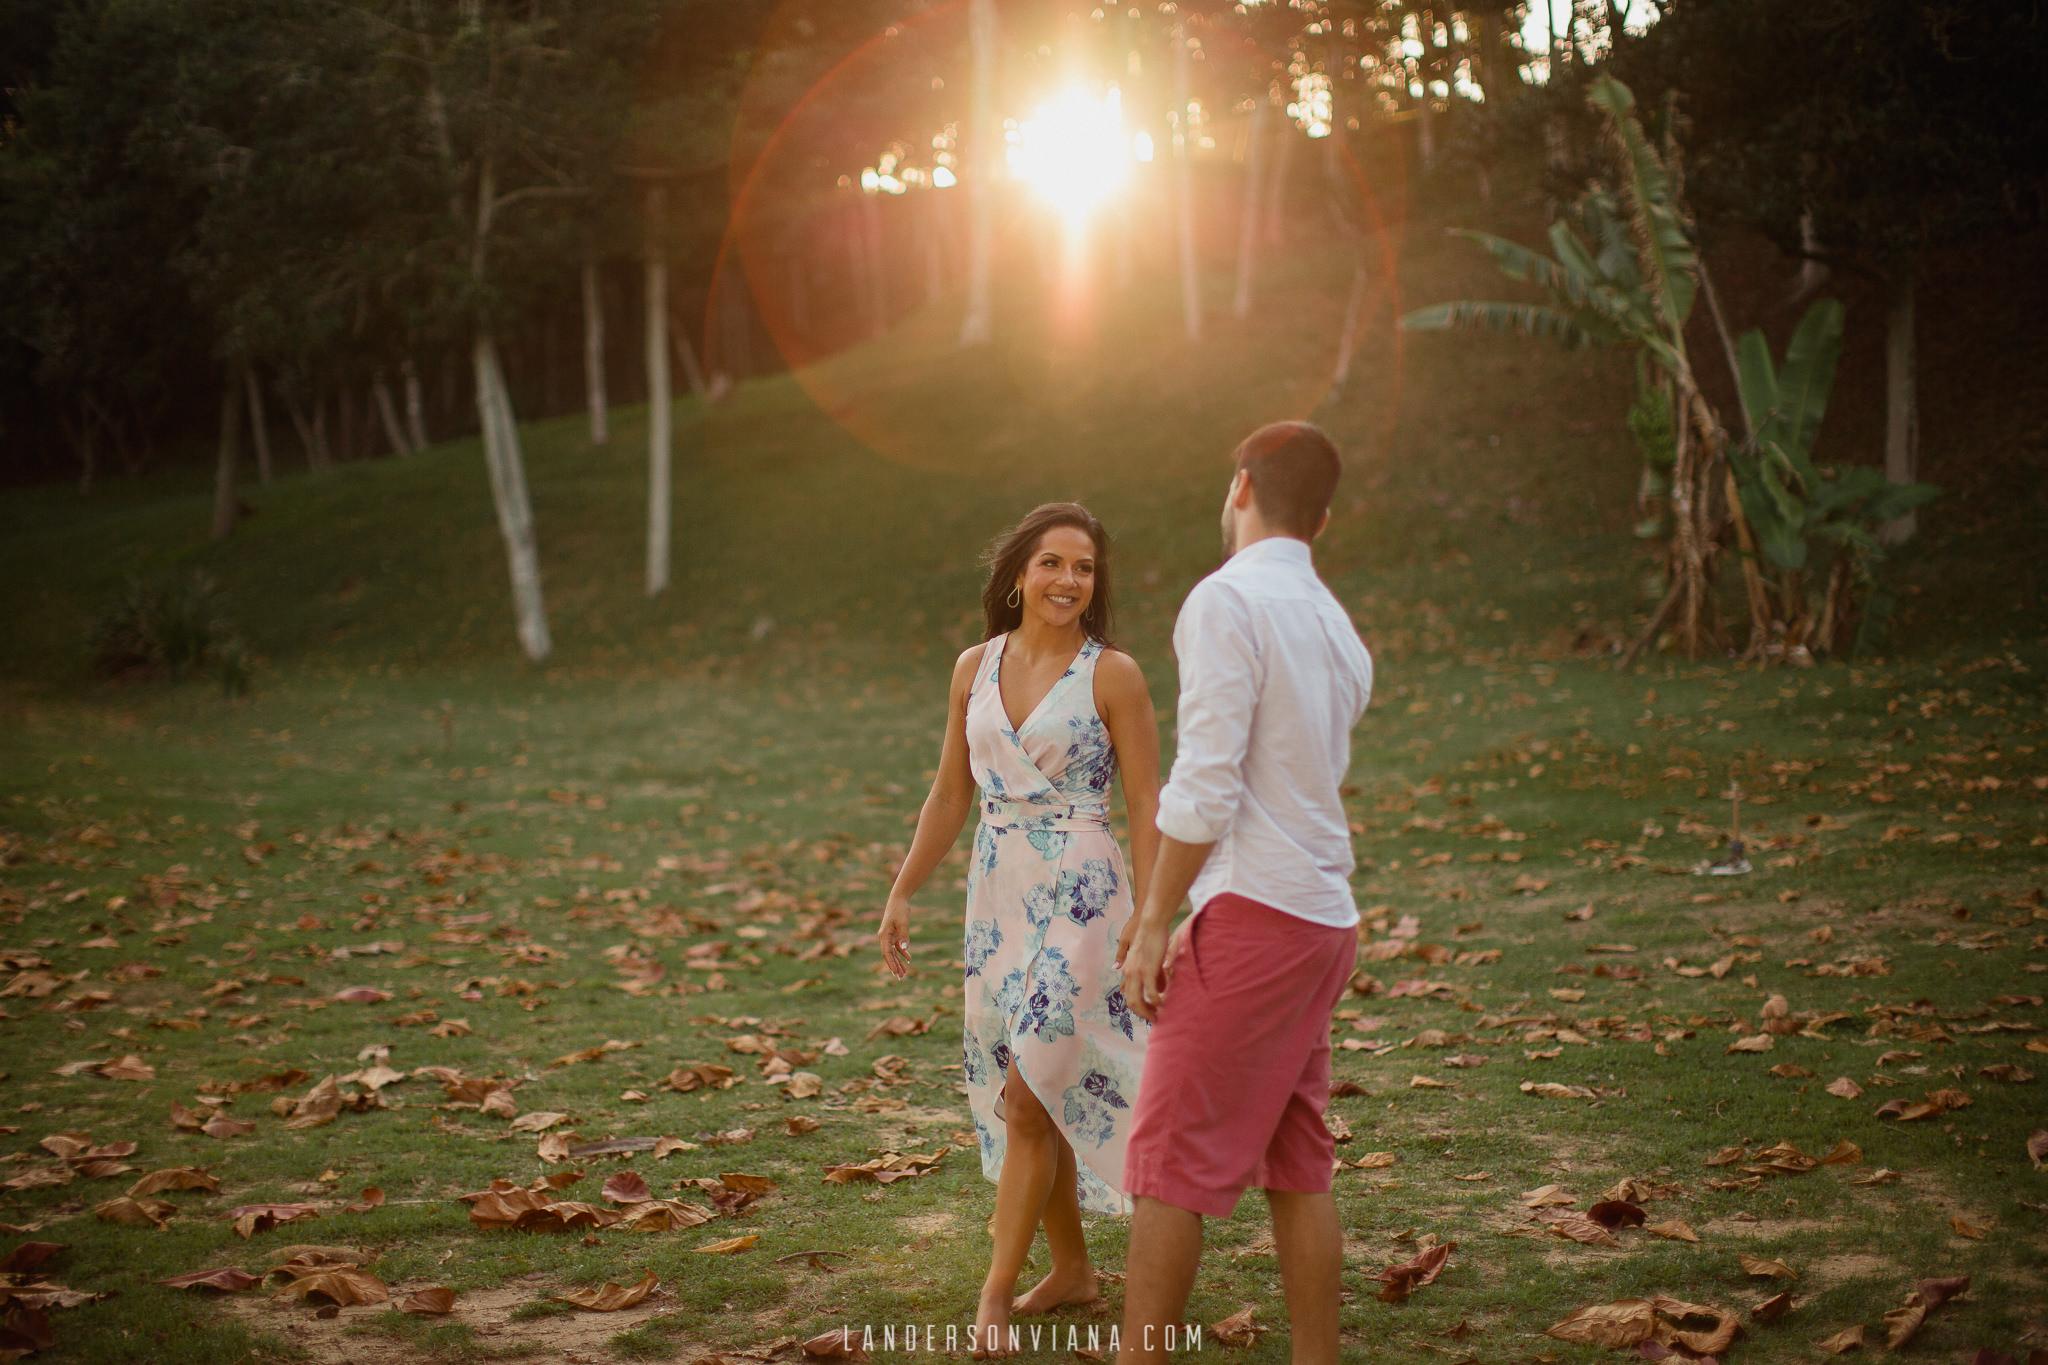 ensaio-pre-wedding-praia-landerson-viana-fotografia-casamento-pegueiobouquet-10.jpg